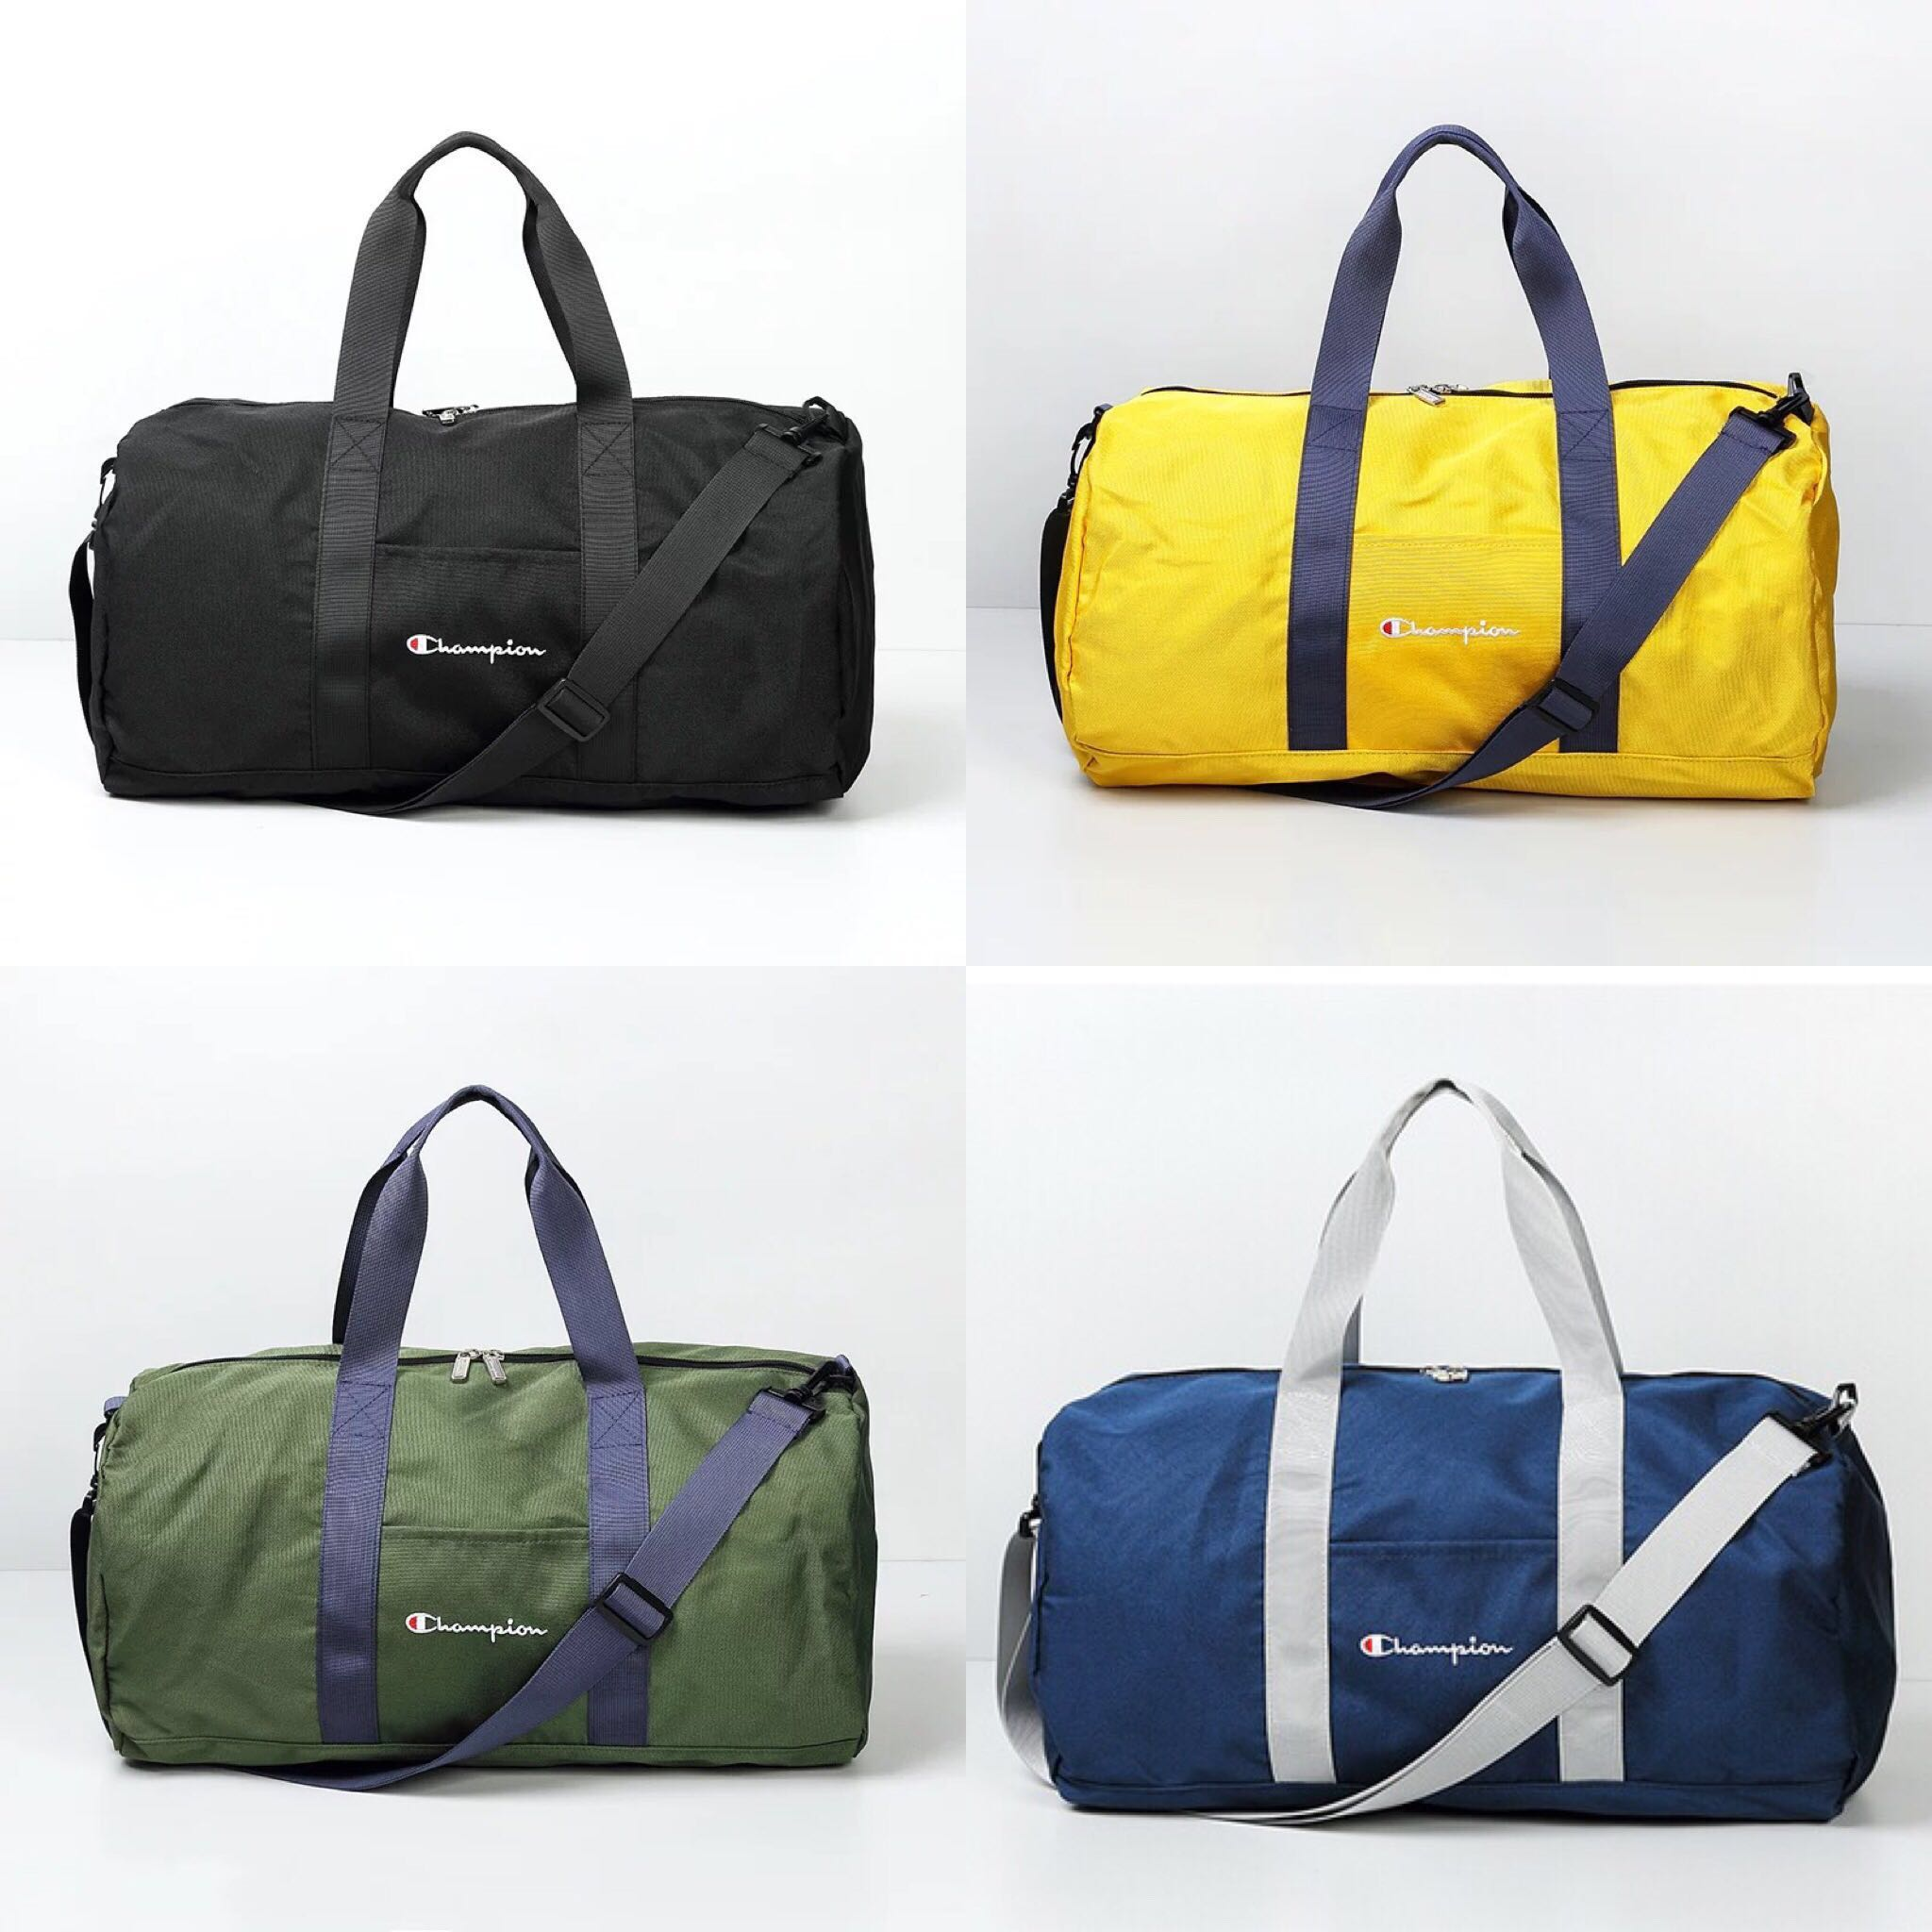 06b4d989d11dd7 INSTOCKS Champion FW18 Colorblock Travel Gym Bag